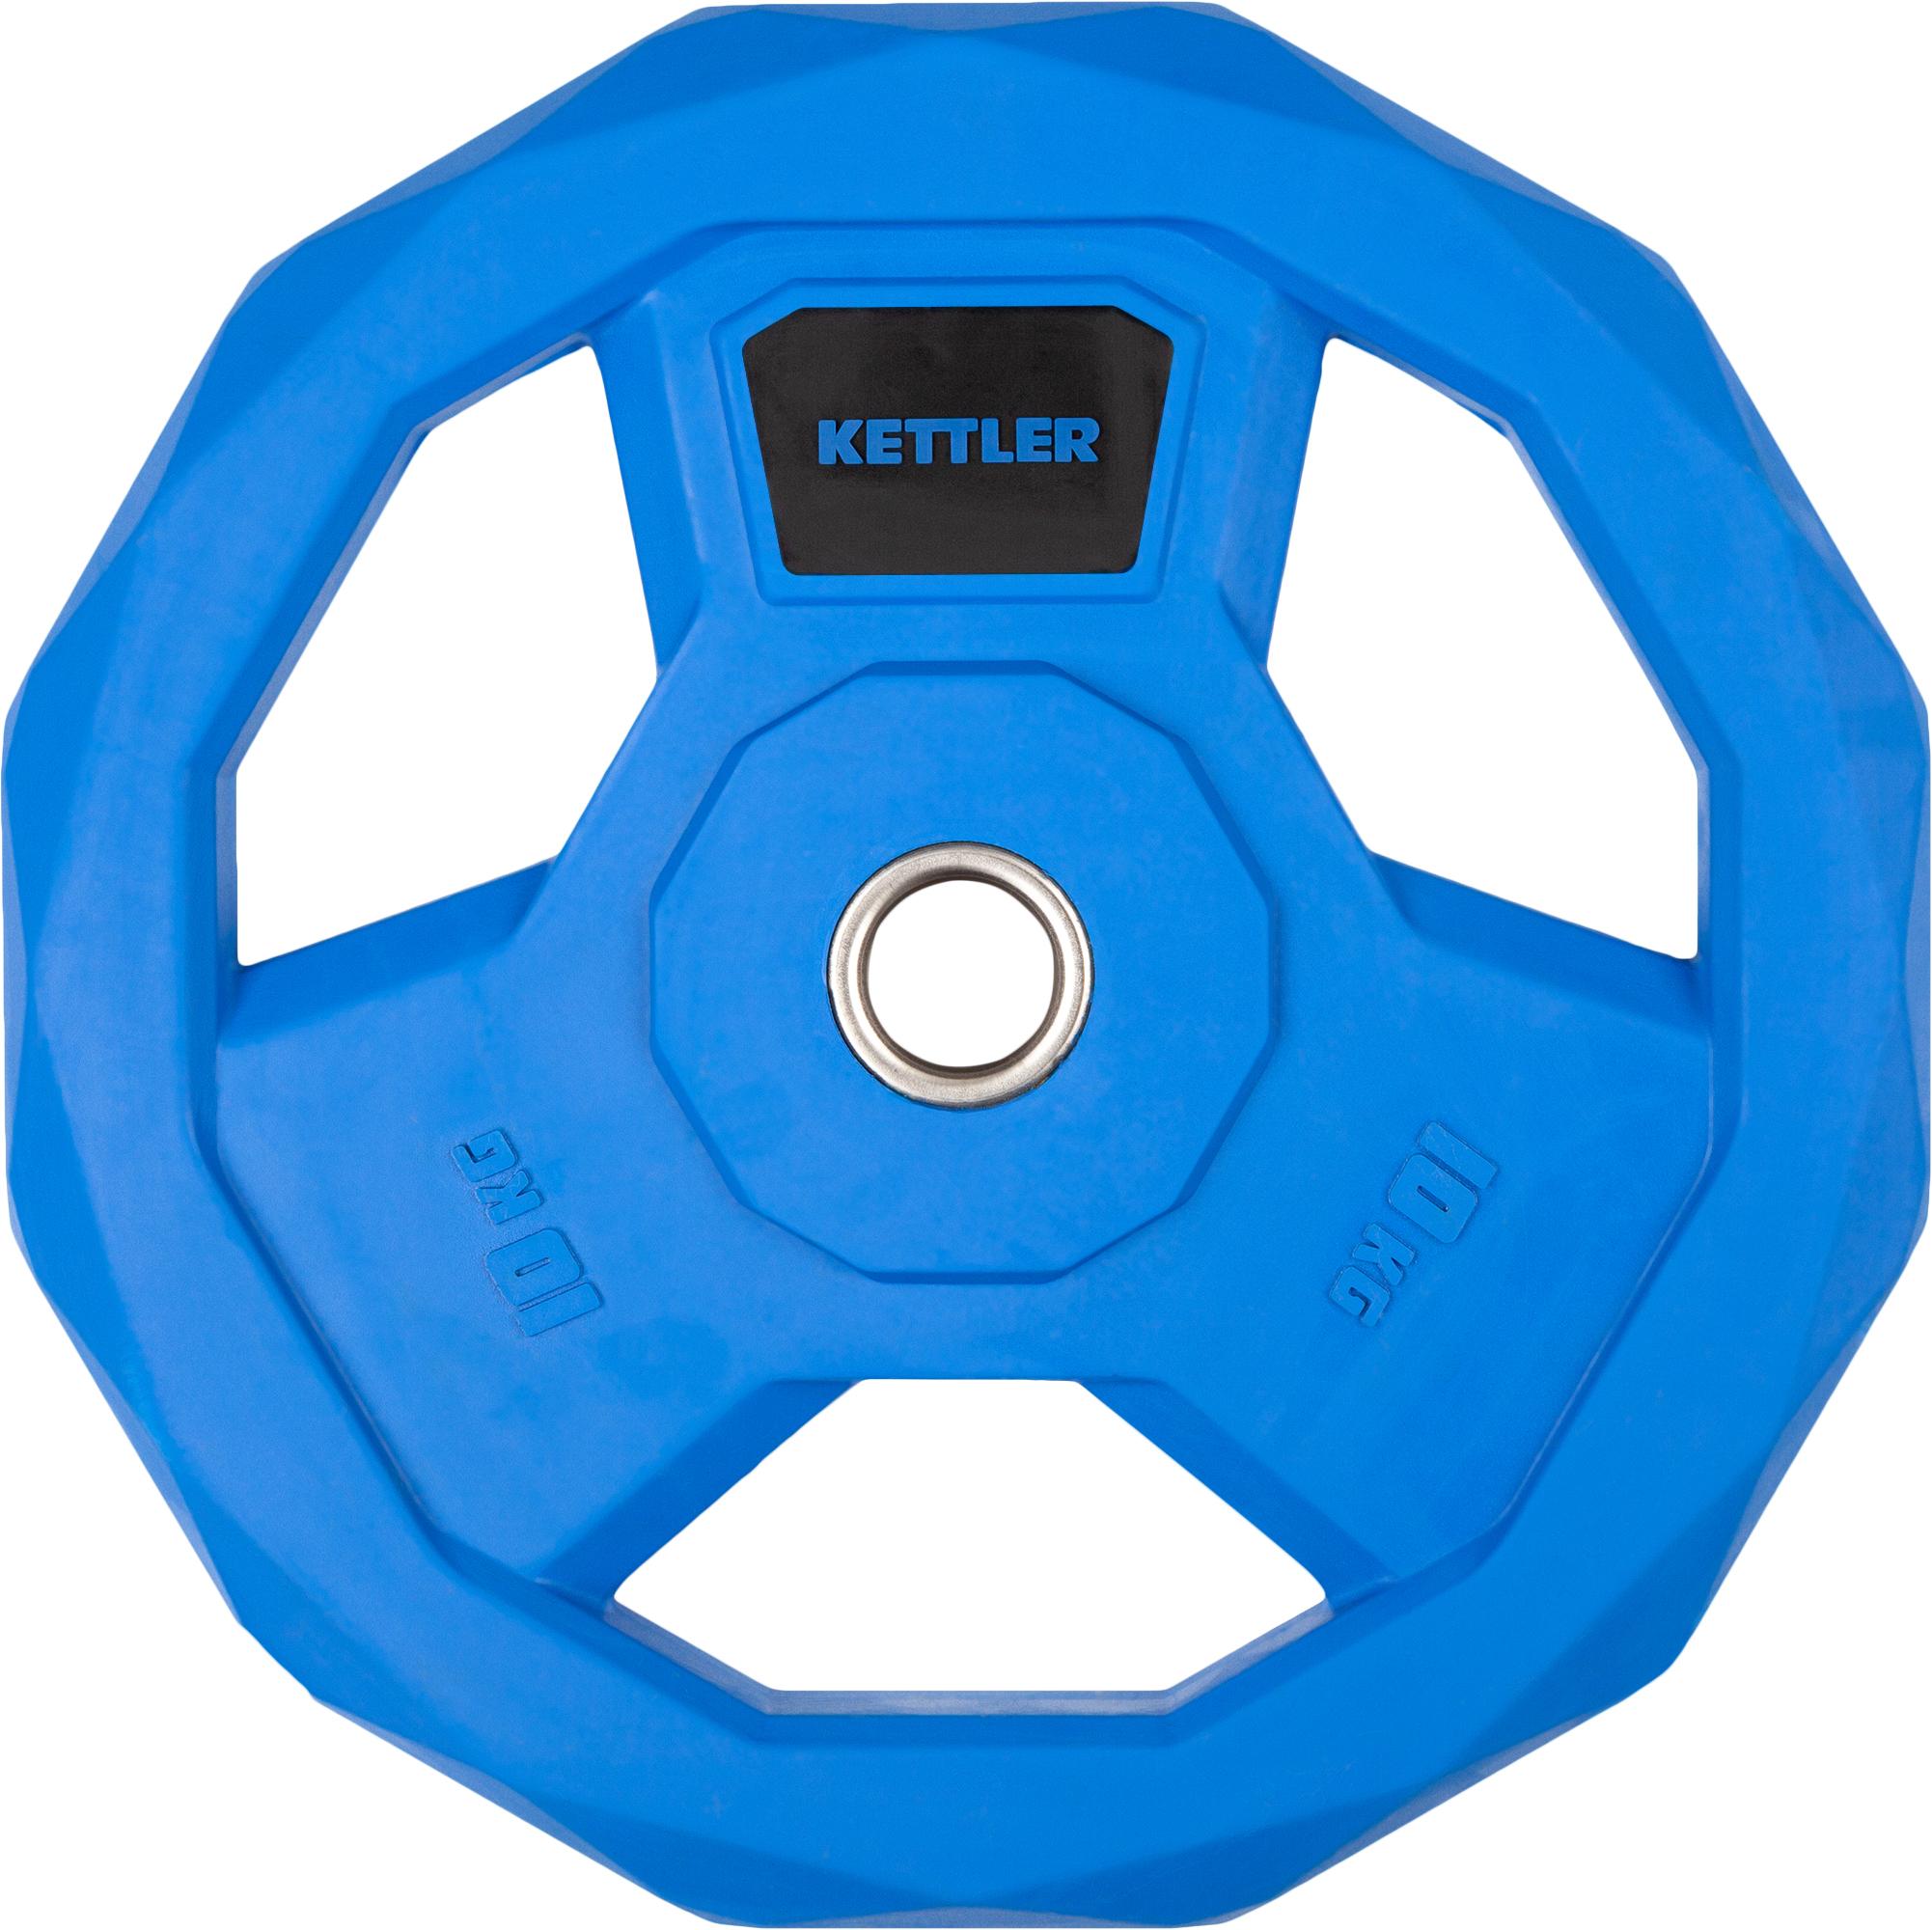 Kettler Блин стальной обрезиненный Kettler 10 кг